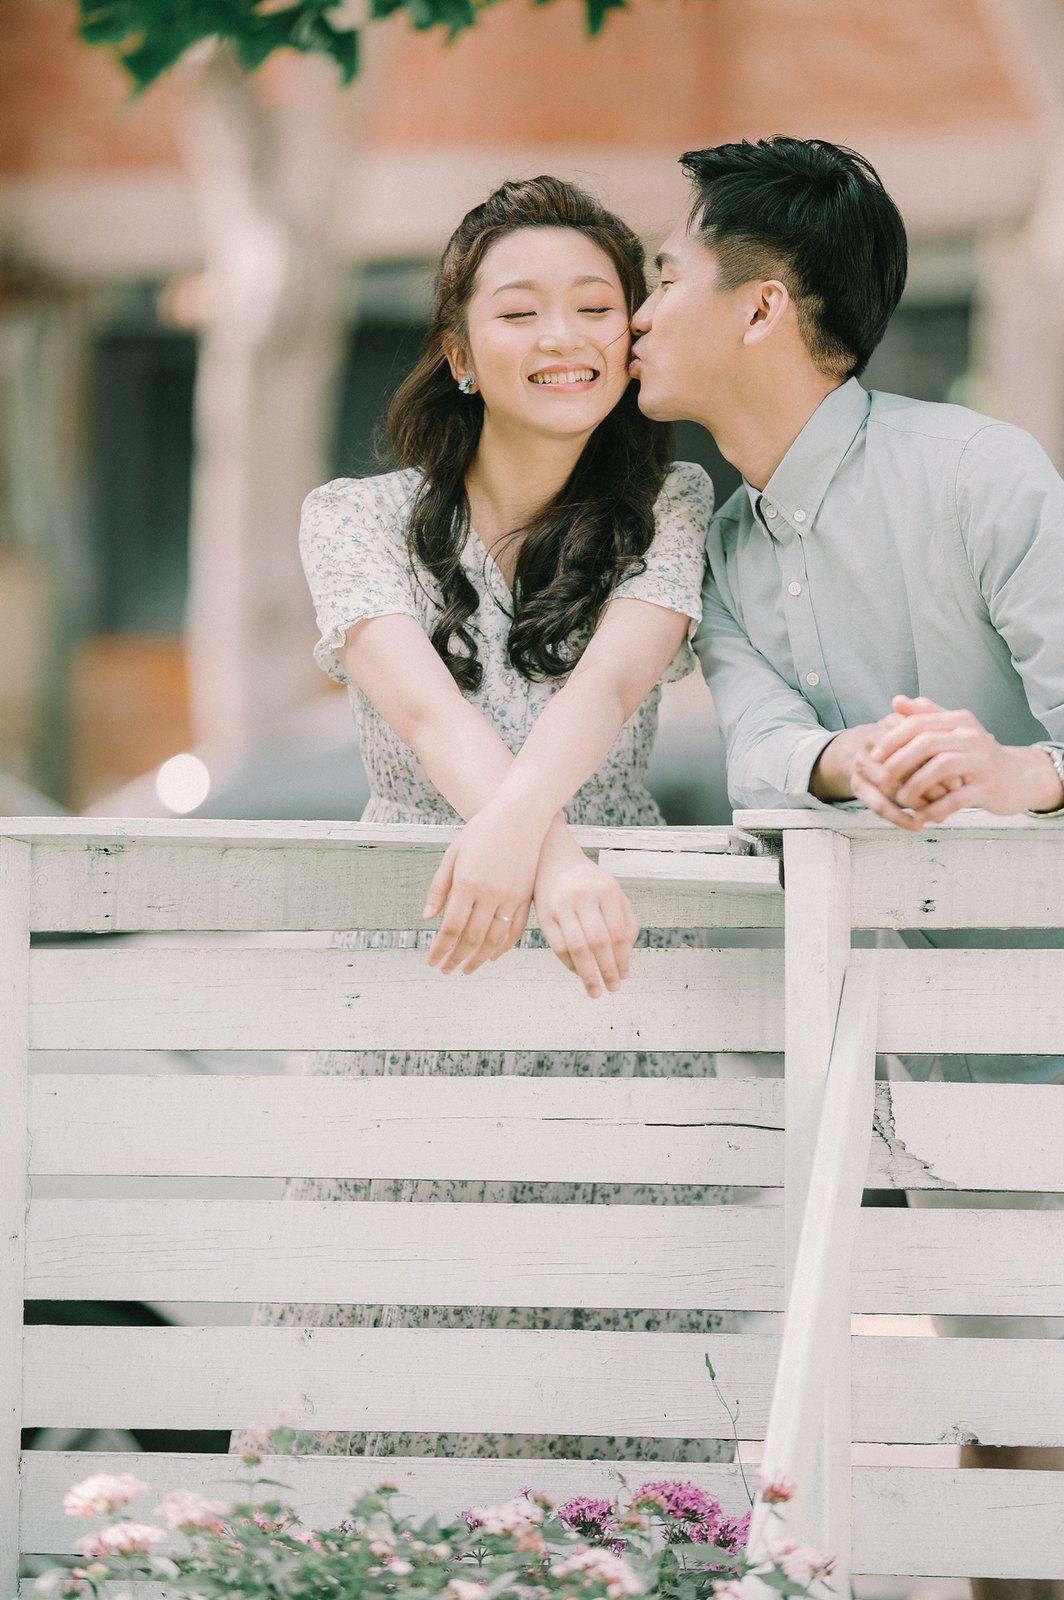 【婚紗】Ryan & Jessica / 民生社區 / EASTERN WEDDING studio